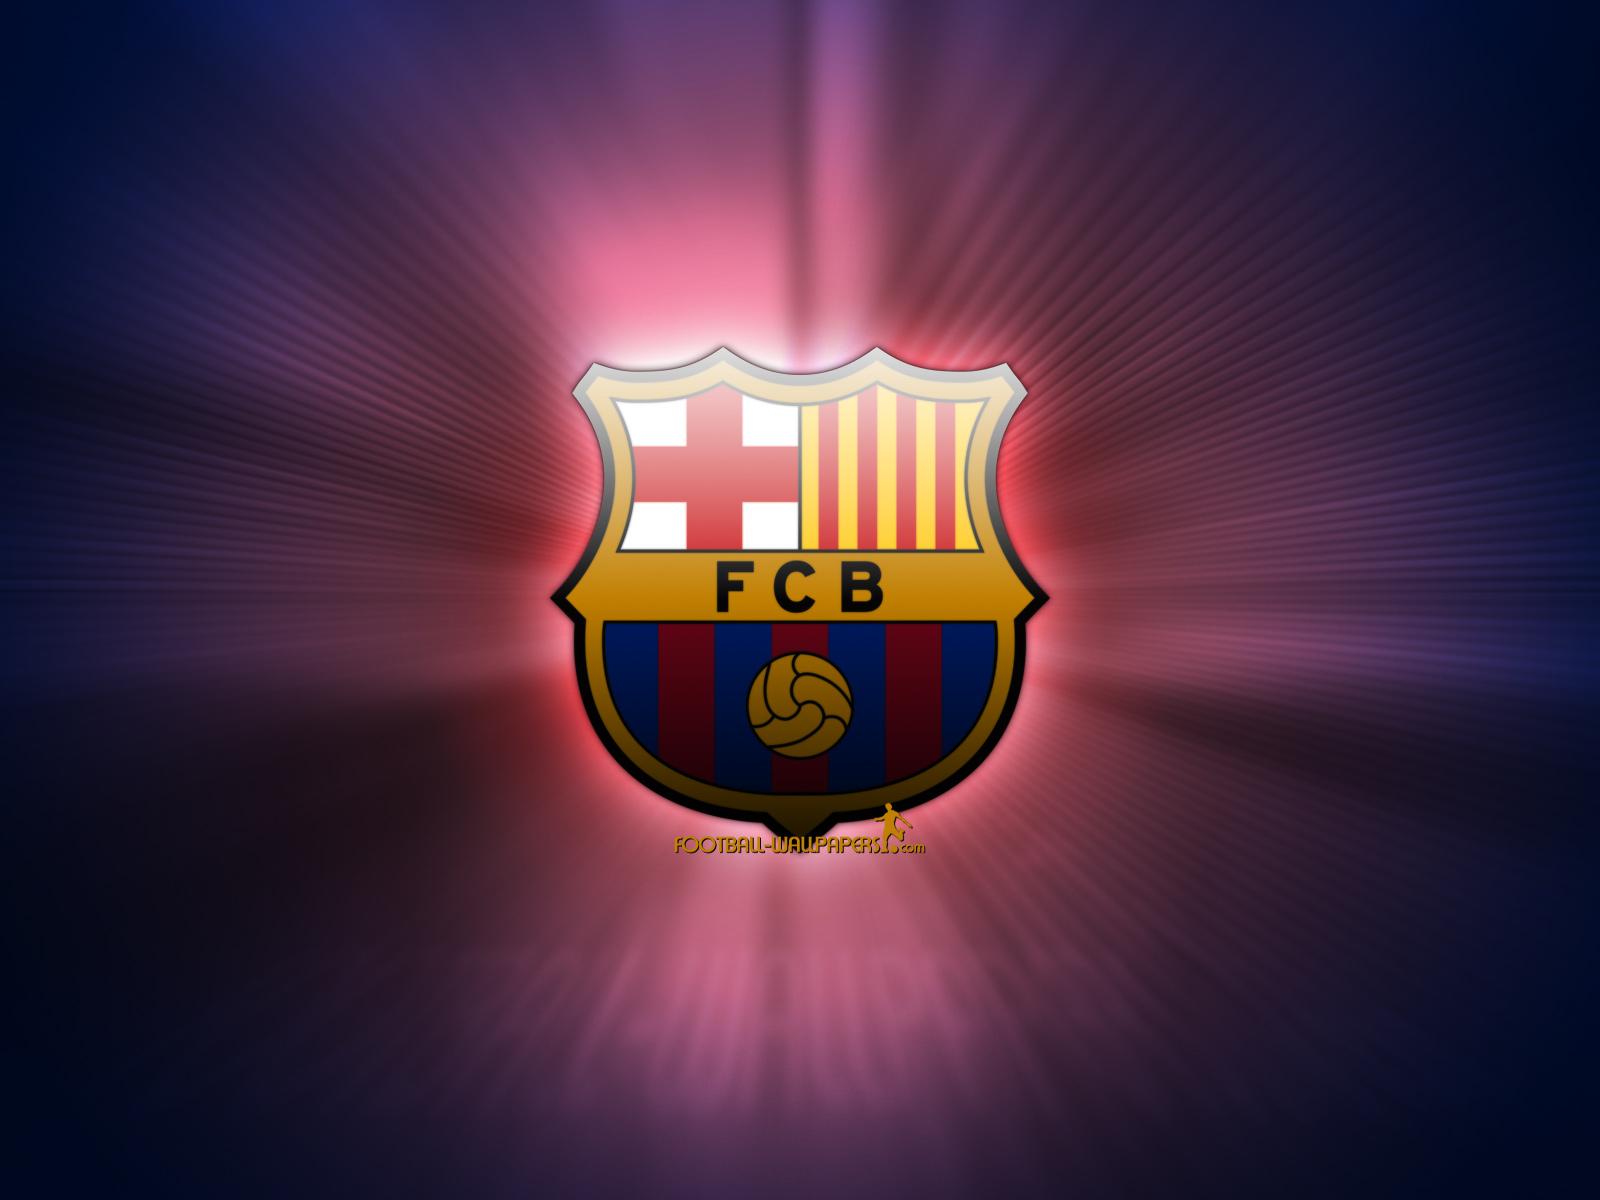 World Sports Hd Wallpapers FC Barcelona Hd Wallpapers 1600x1200